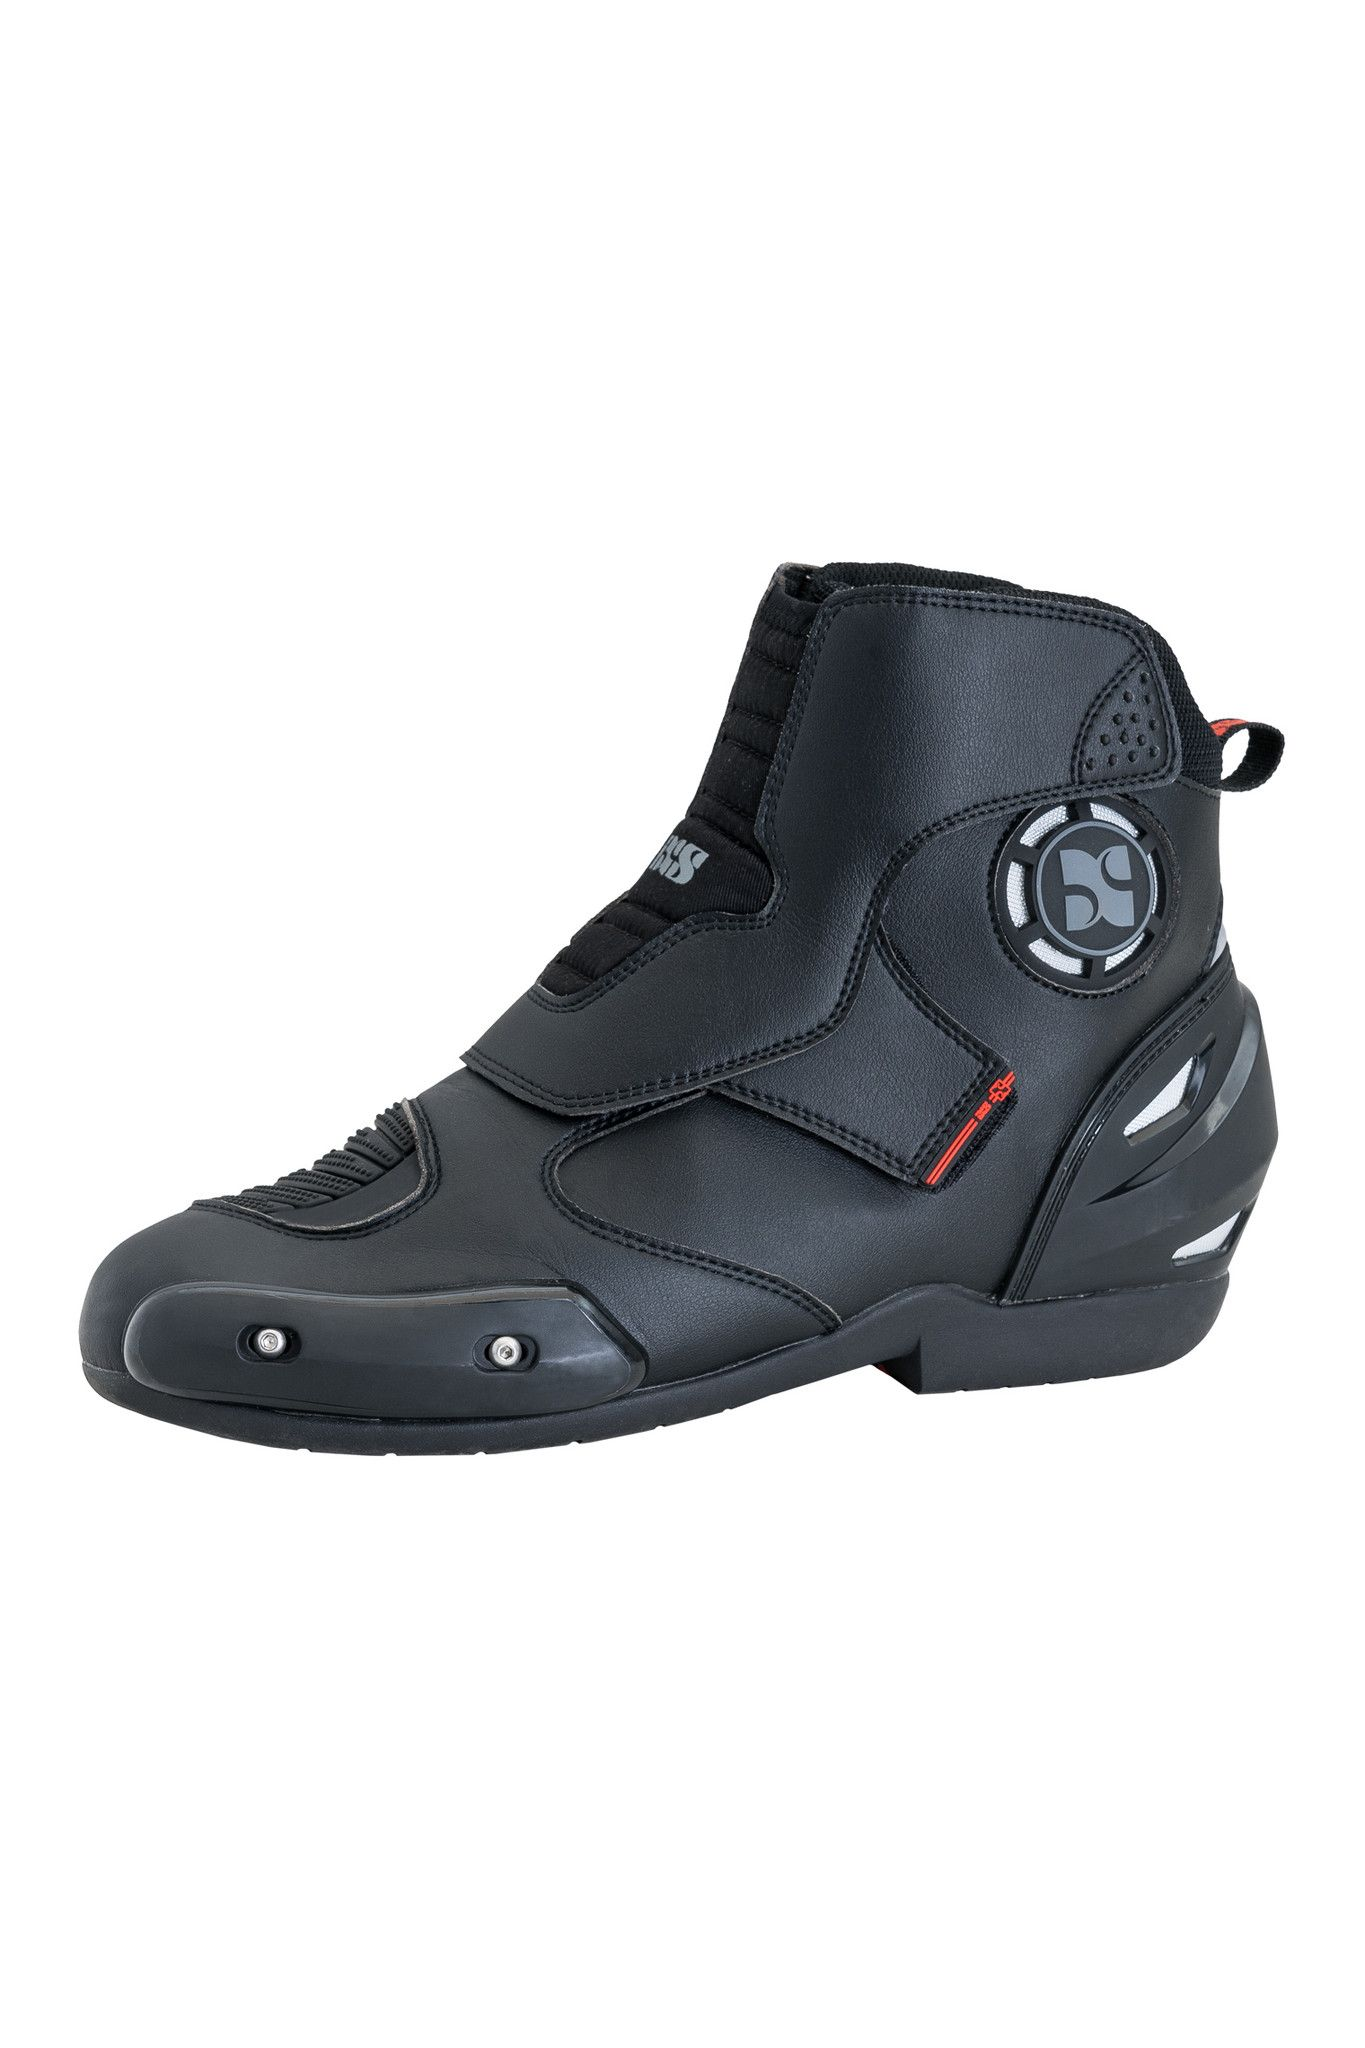 Motorcycle gloves ixs - Streetrunner Motorcycle Sports Shoe Ixs Motorcycle Fashion Motorcycles Gear